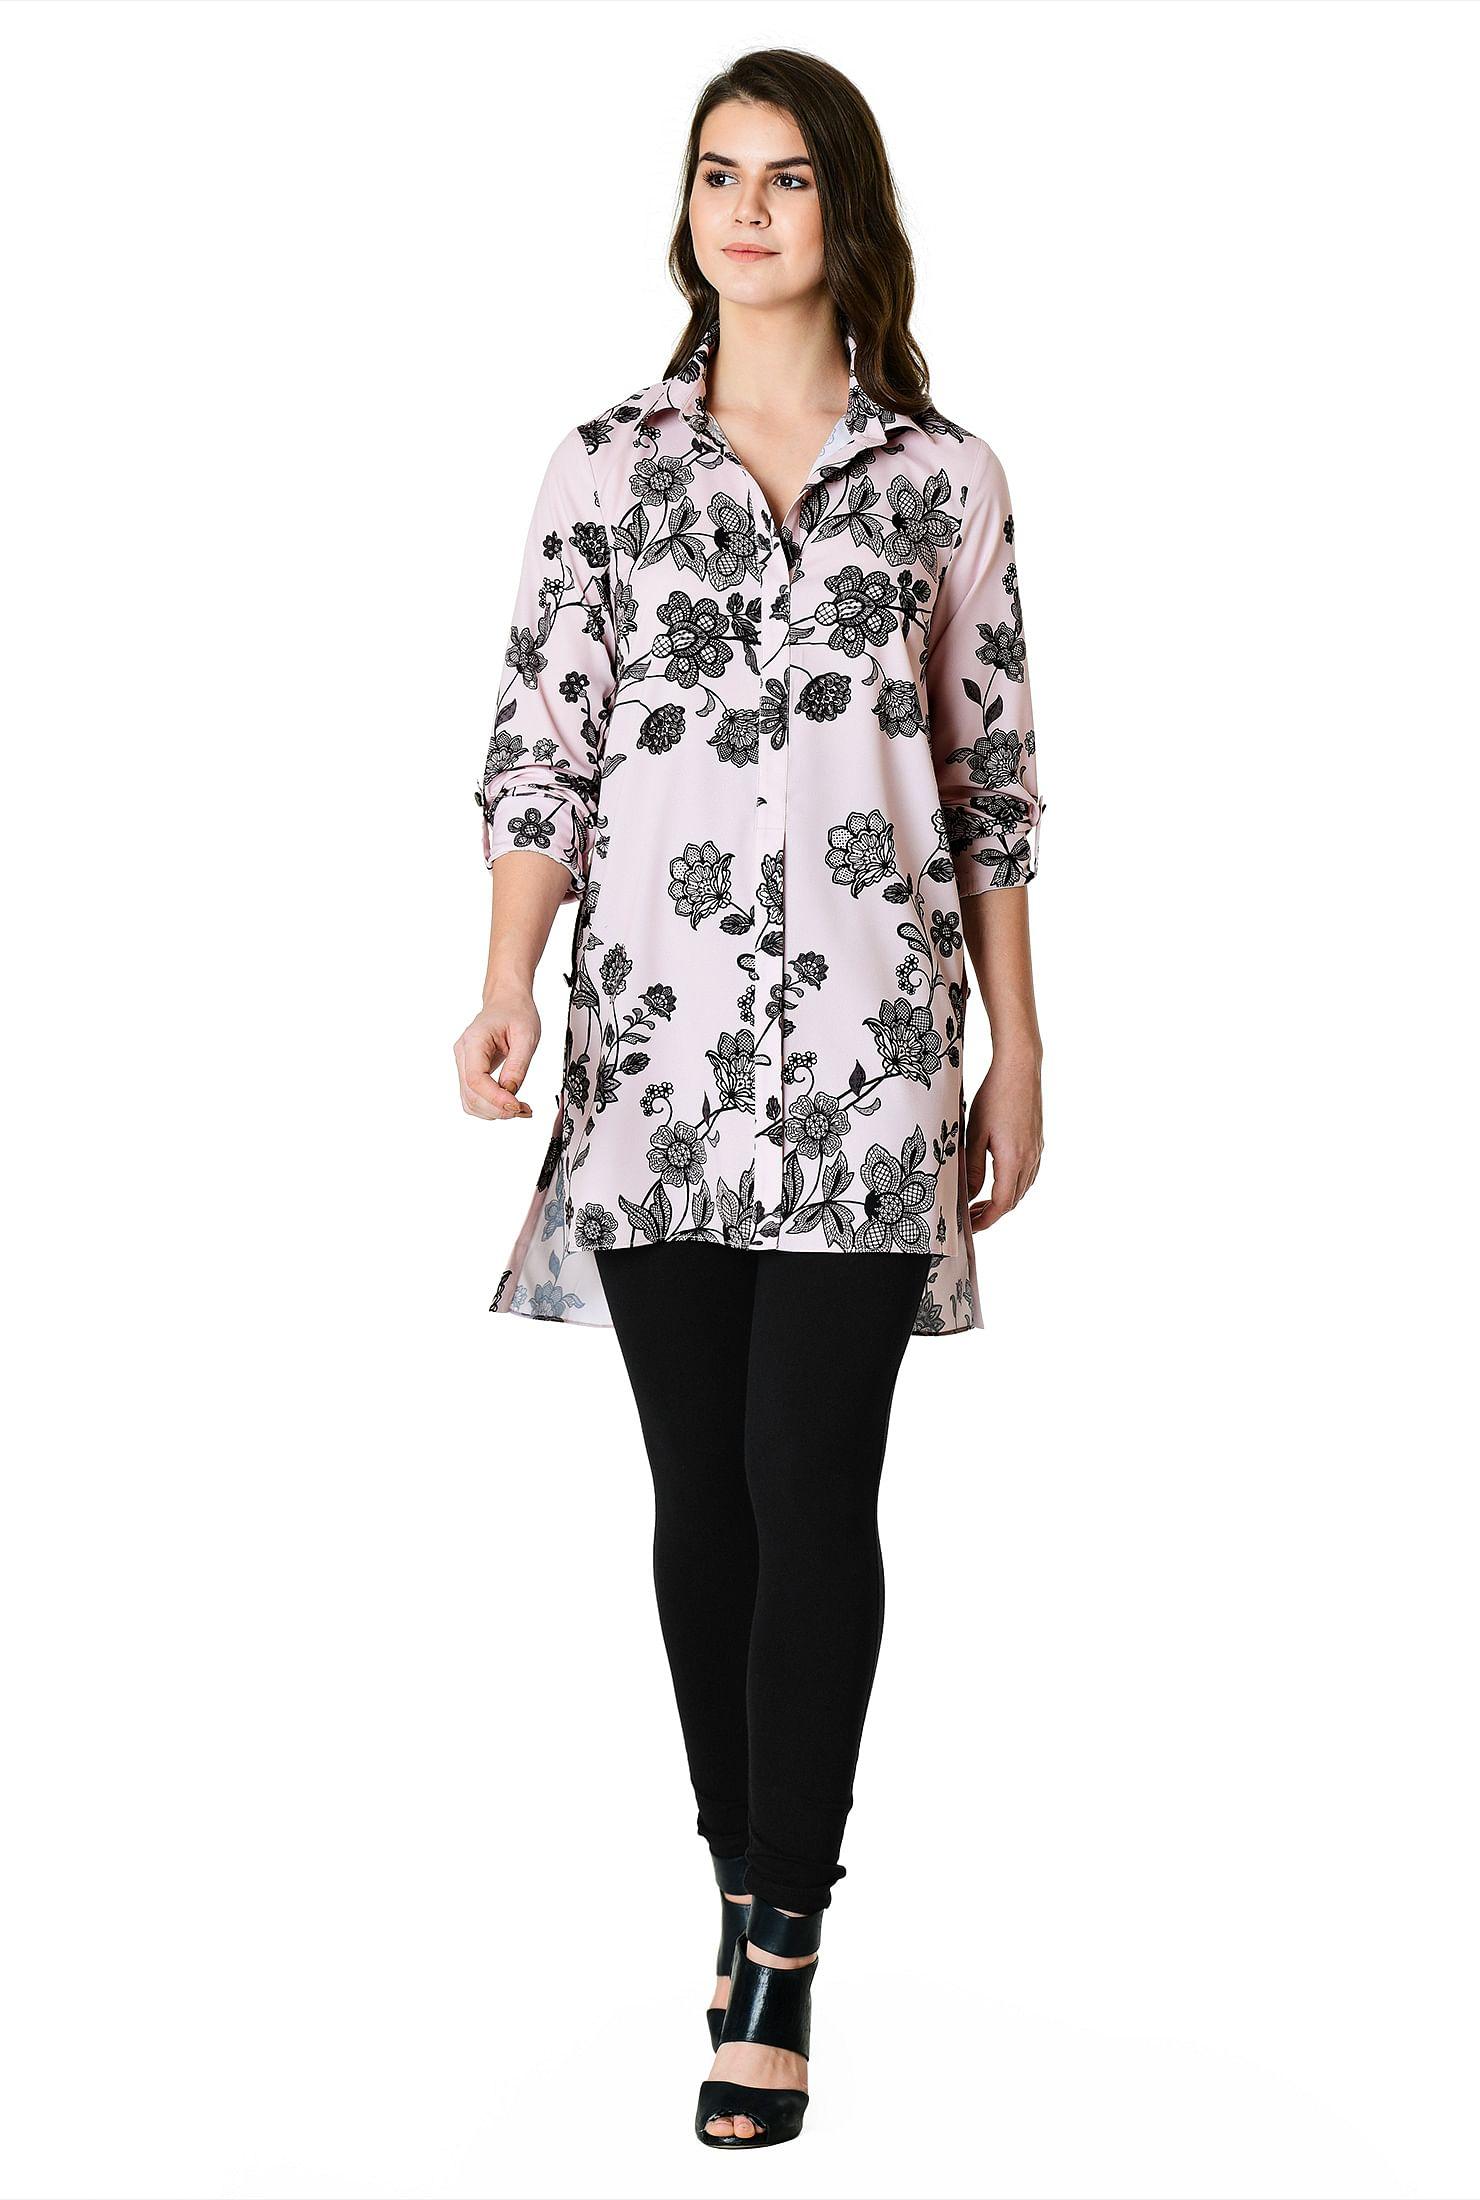 832574f9e Women s Fashion Clothing 0-36W and Custom